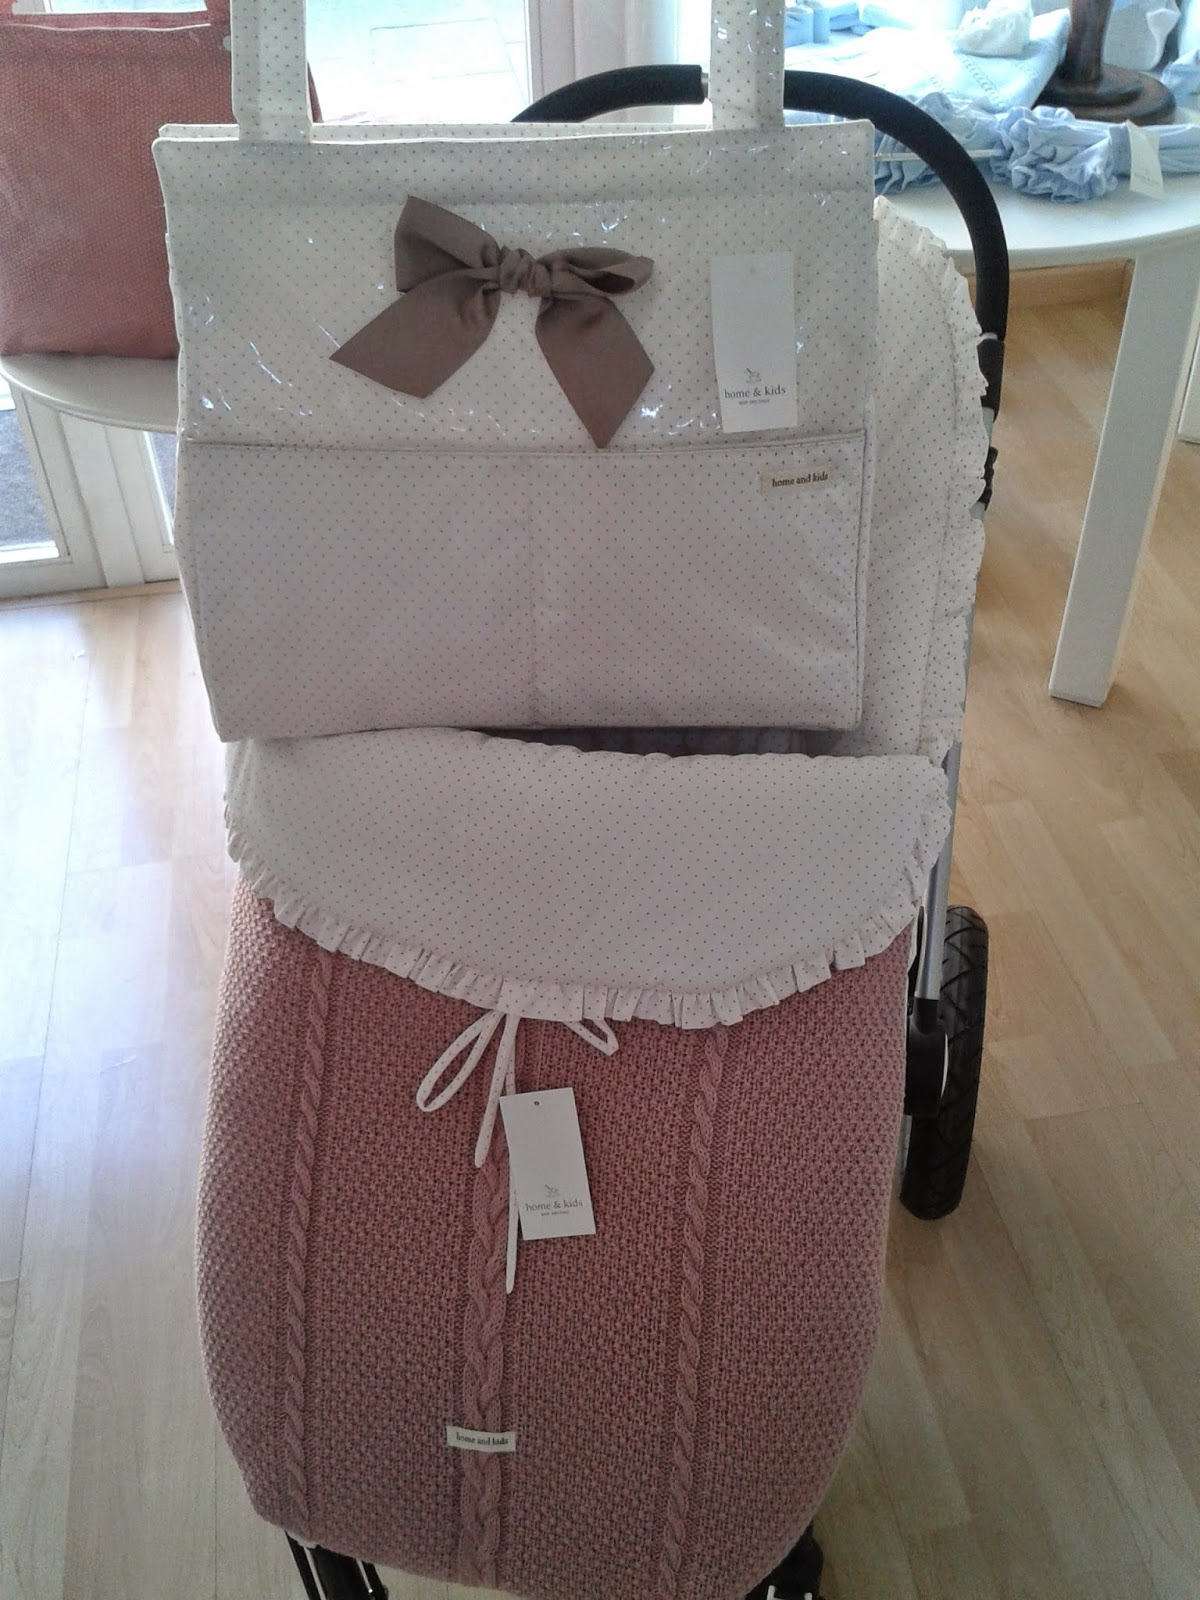 Lazos beb s saco silla home kids punto rosado y panera - Sacos silla bebe baratos ...